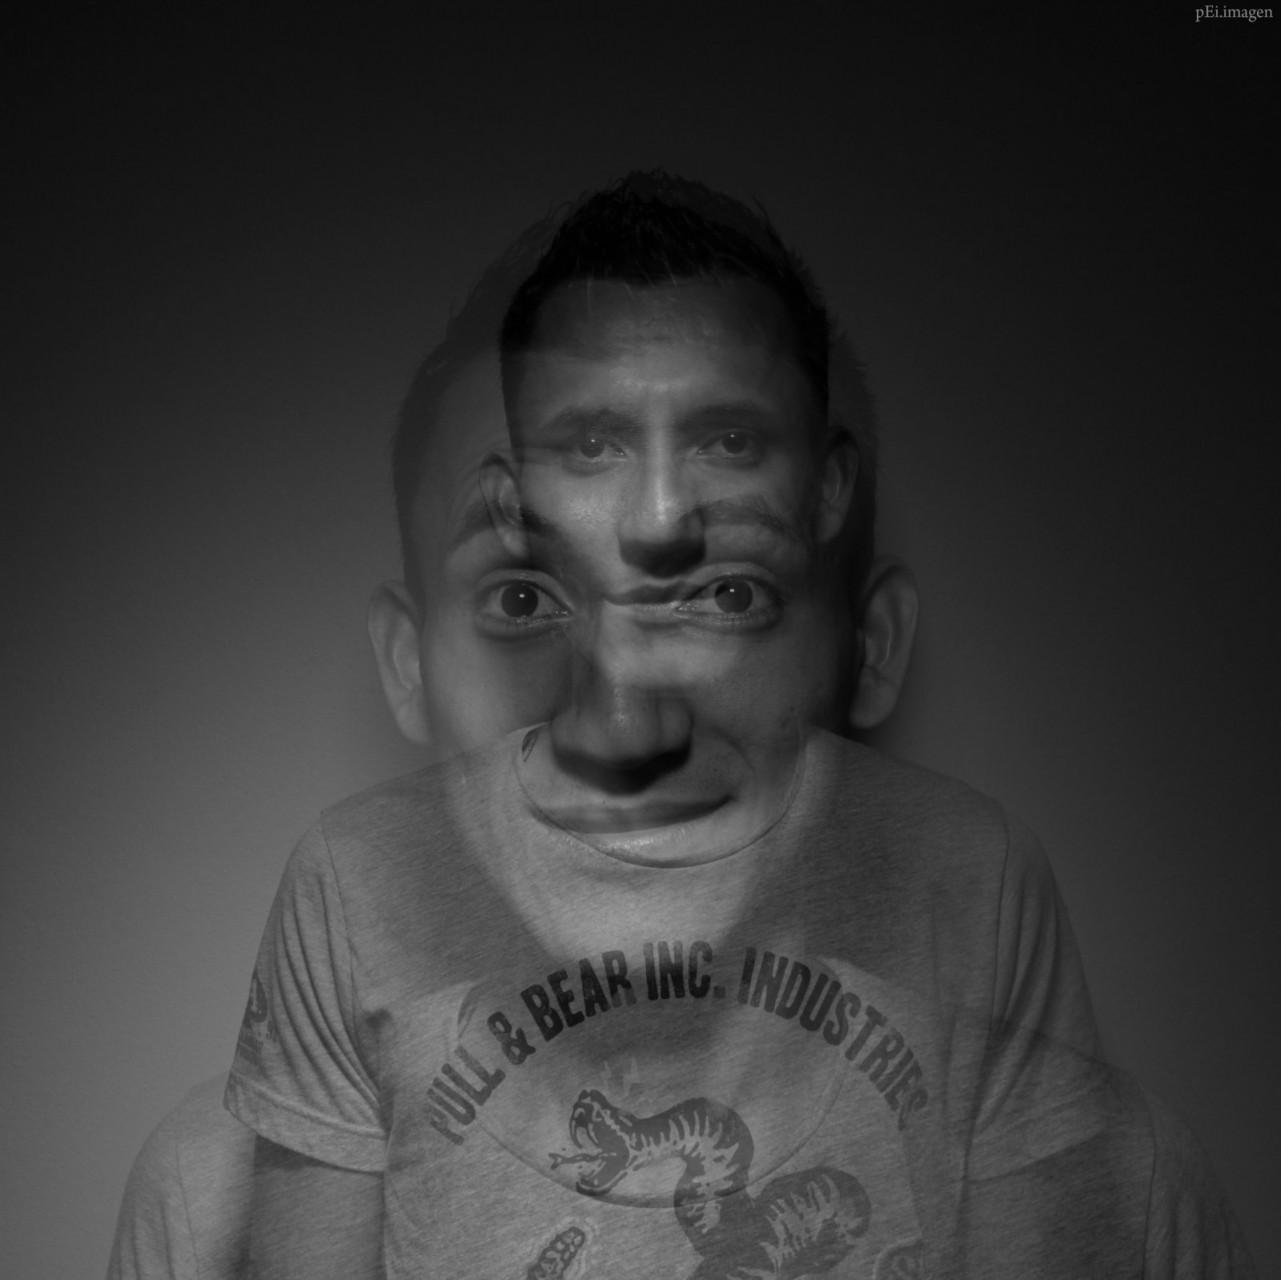 peipegata me myself I proyectos fotografia peipegatafotografia # 036 Fernando Rivera